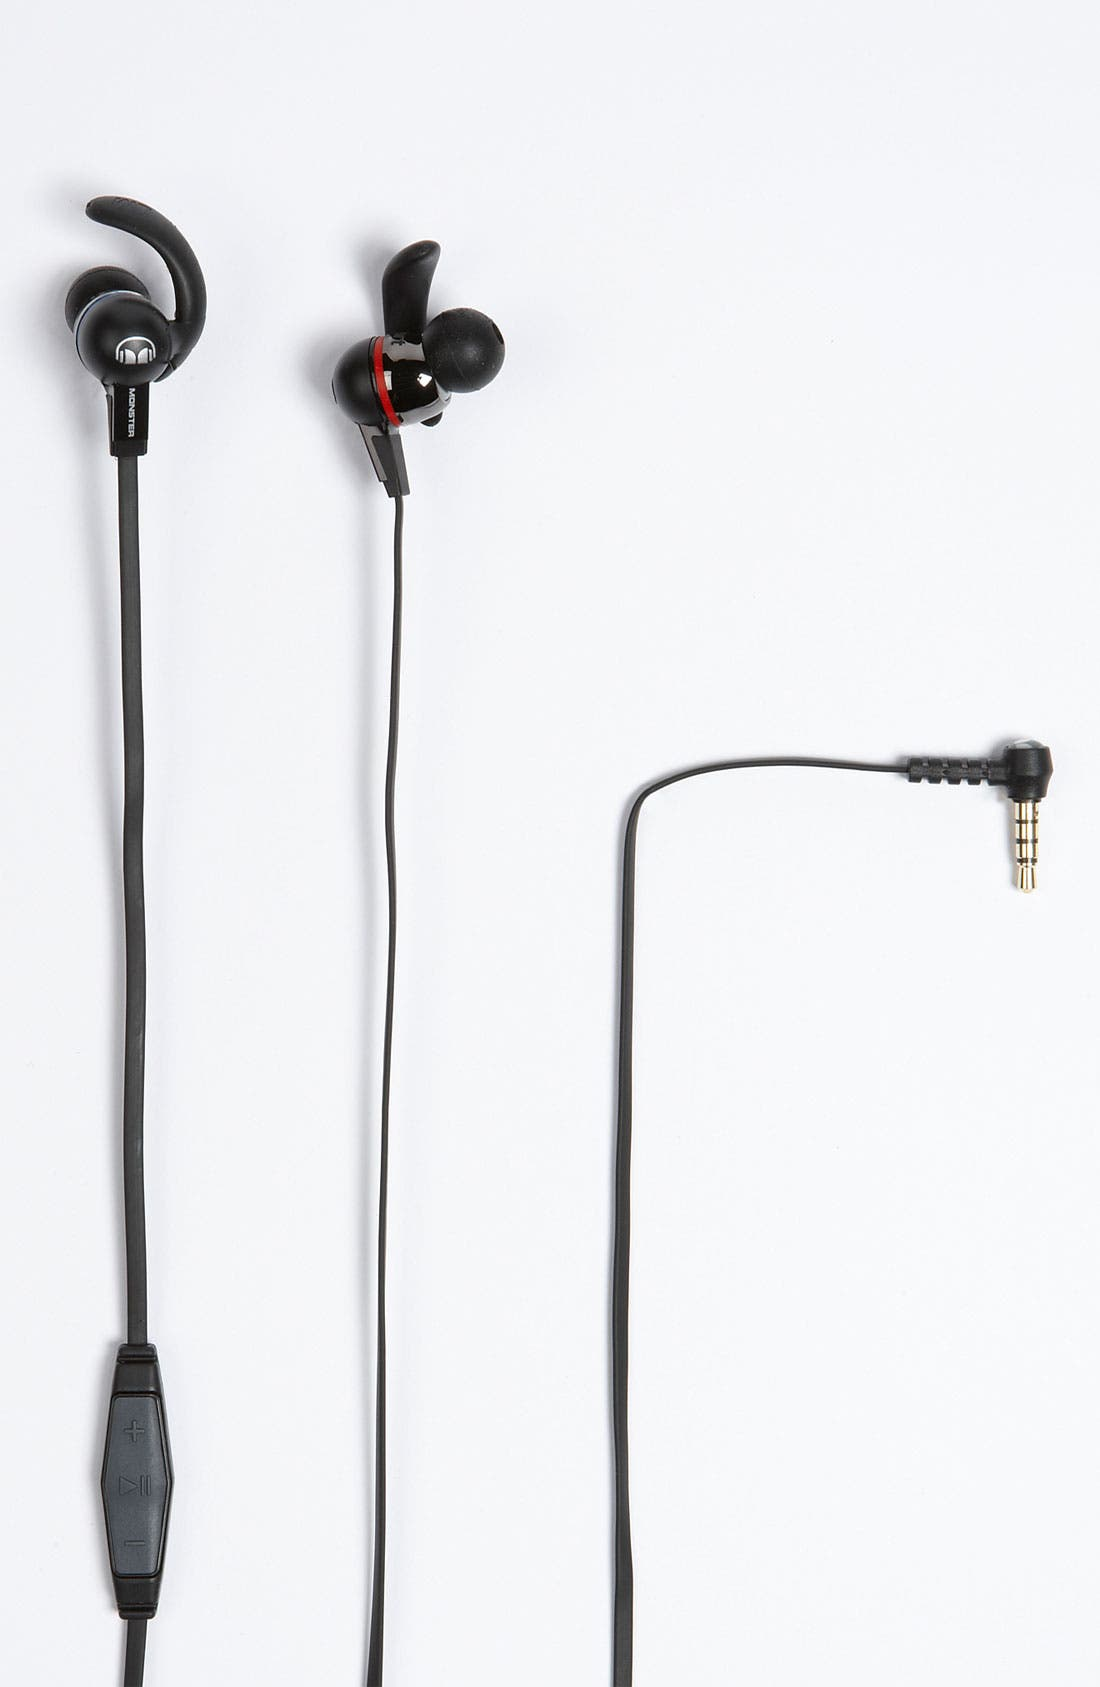 Alternate Image 1 Selected - Monster 'iSport Immersion' Headphones